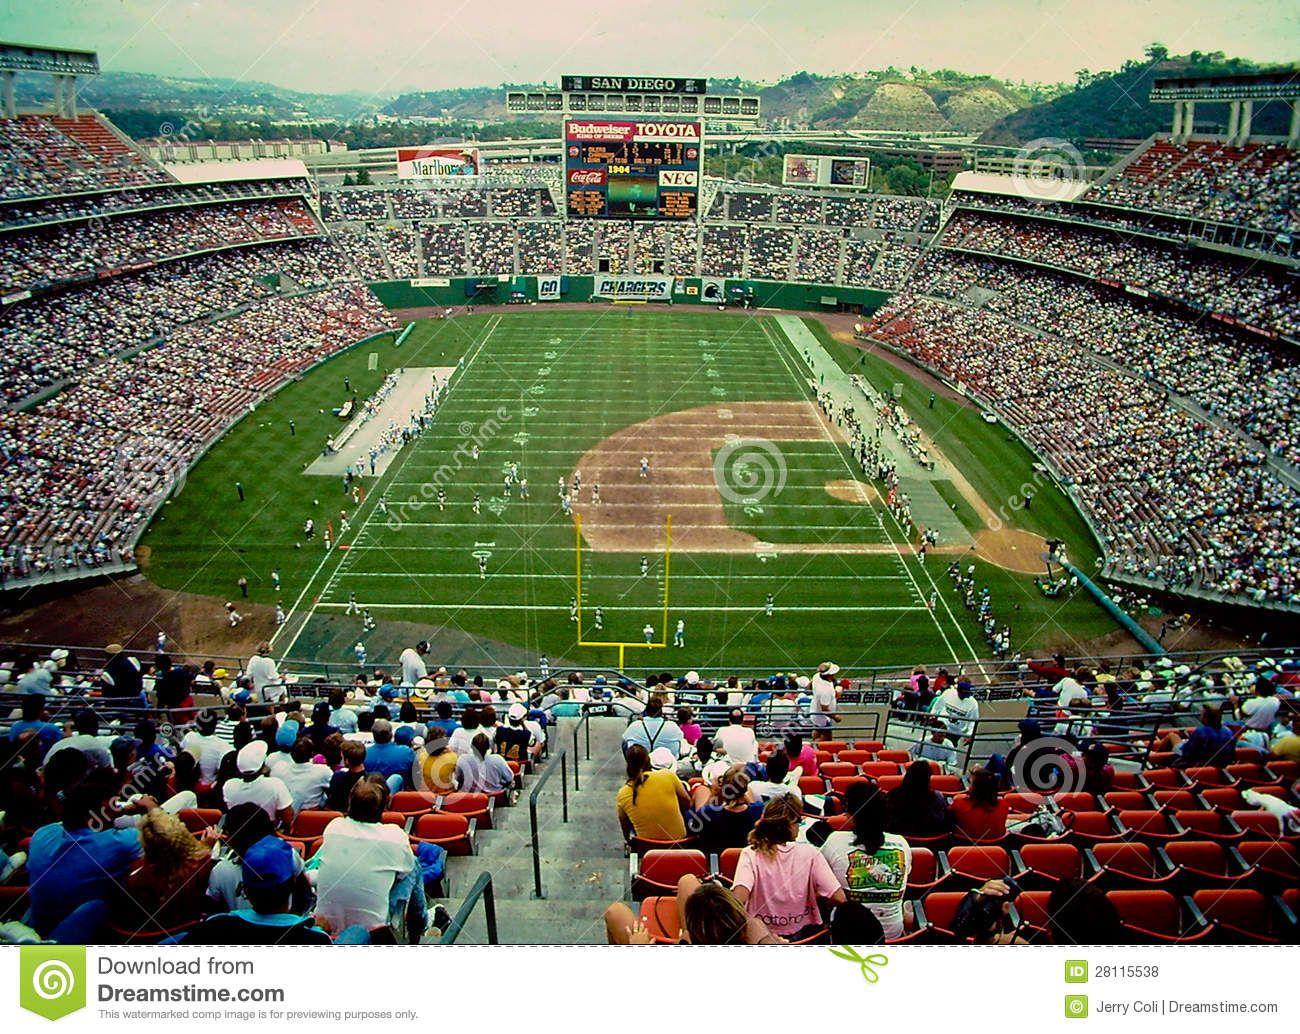 murphy stadium san diego | Vintage image of Jack Murphy ... Qualcomm Stadium Baseballfootball